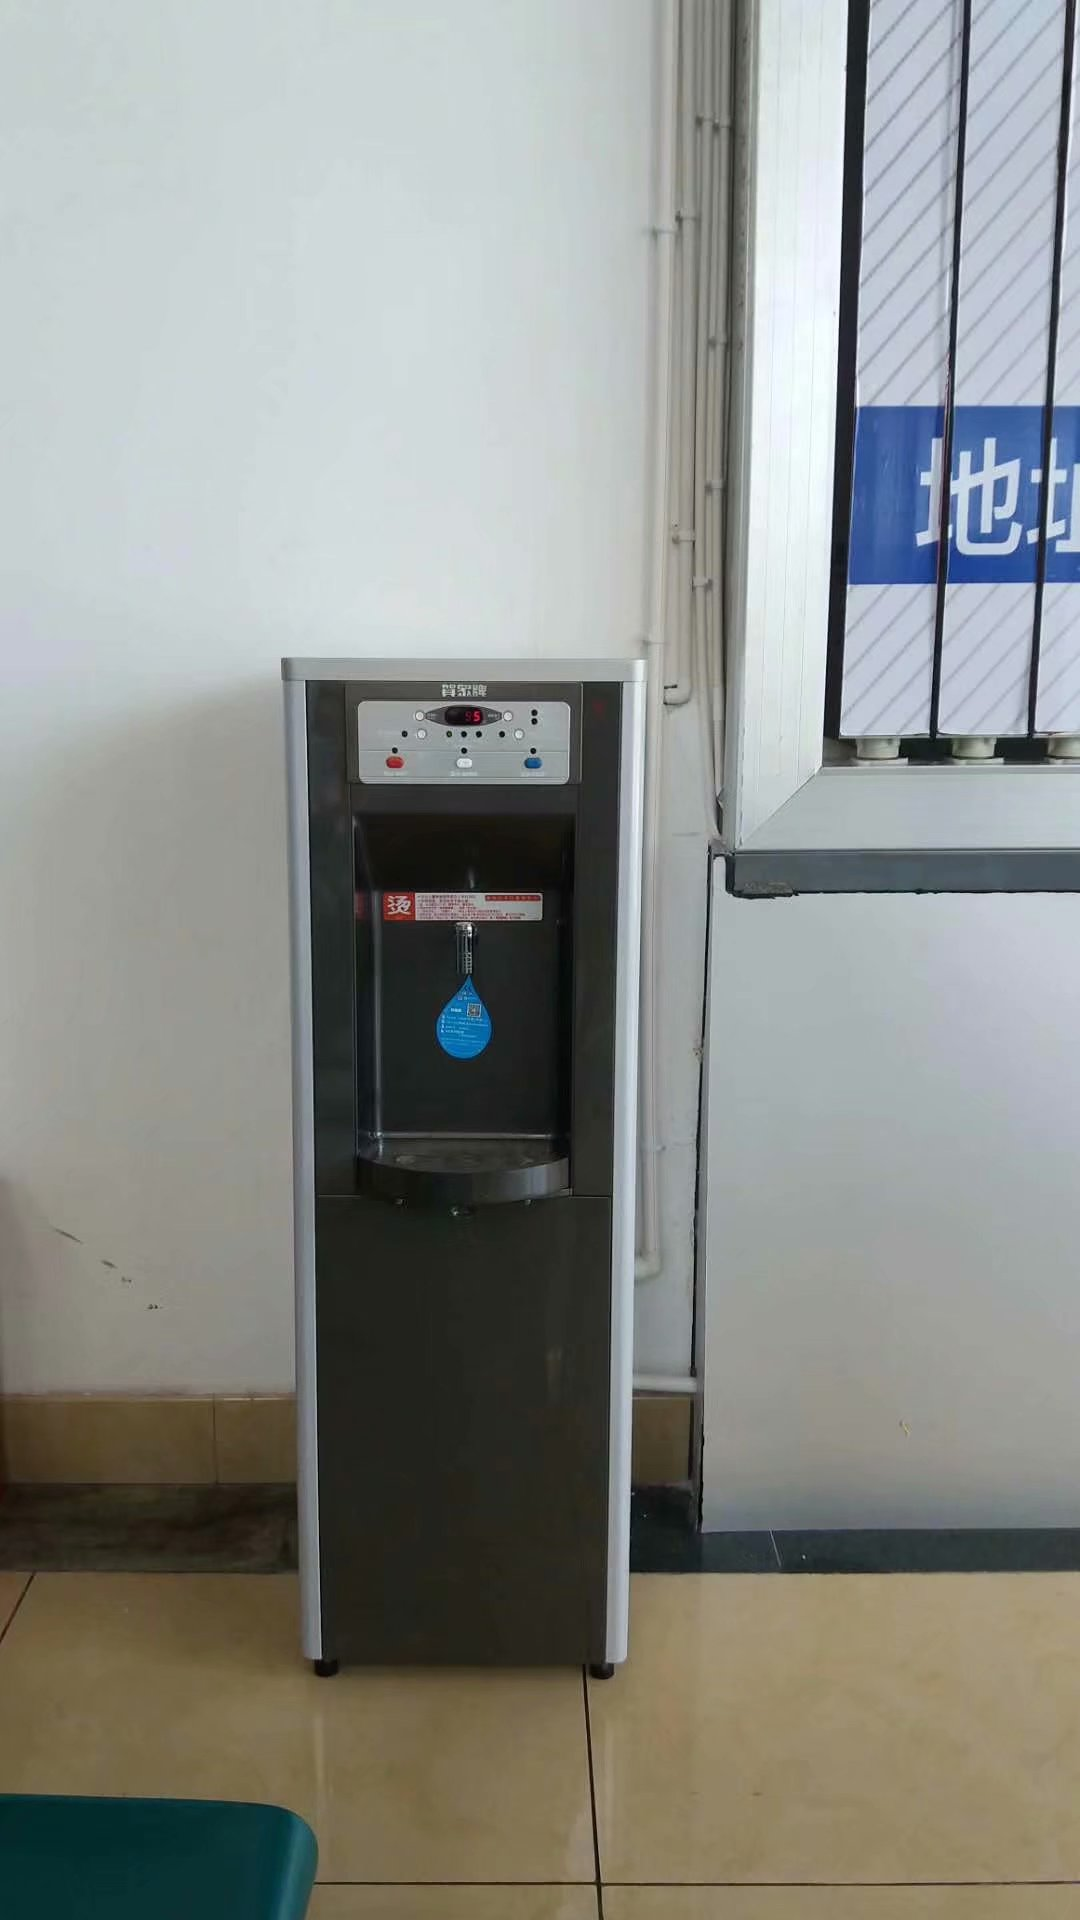 betway体育手机版_四川betway必威app牌饮水机入驻广元机场